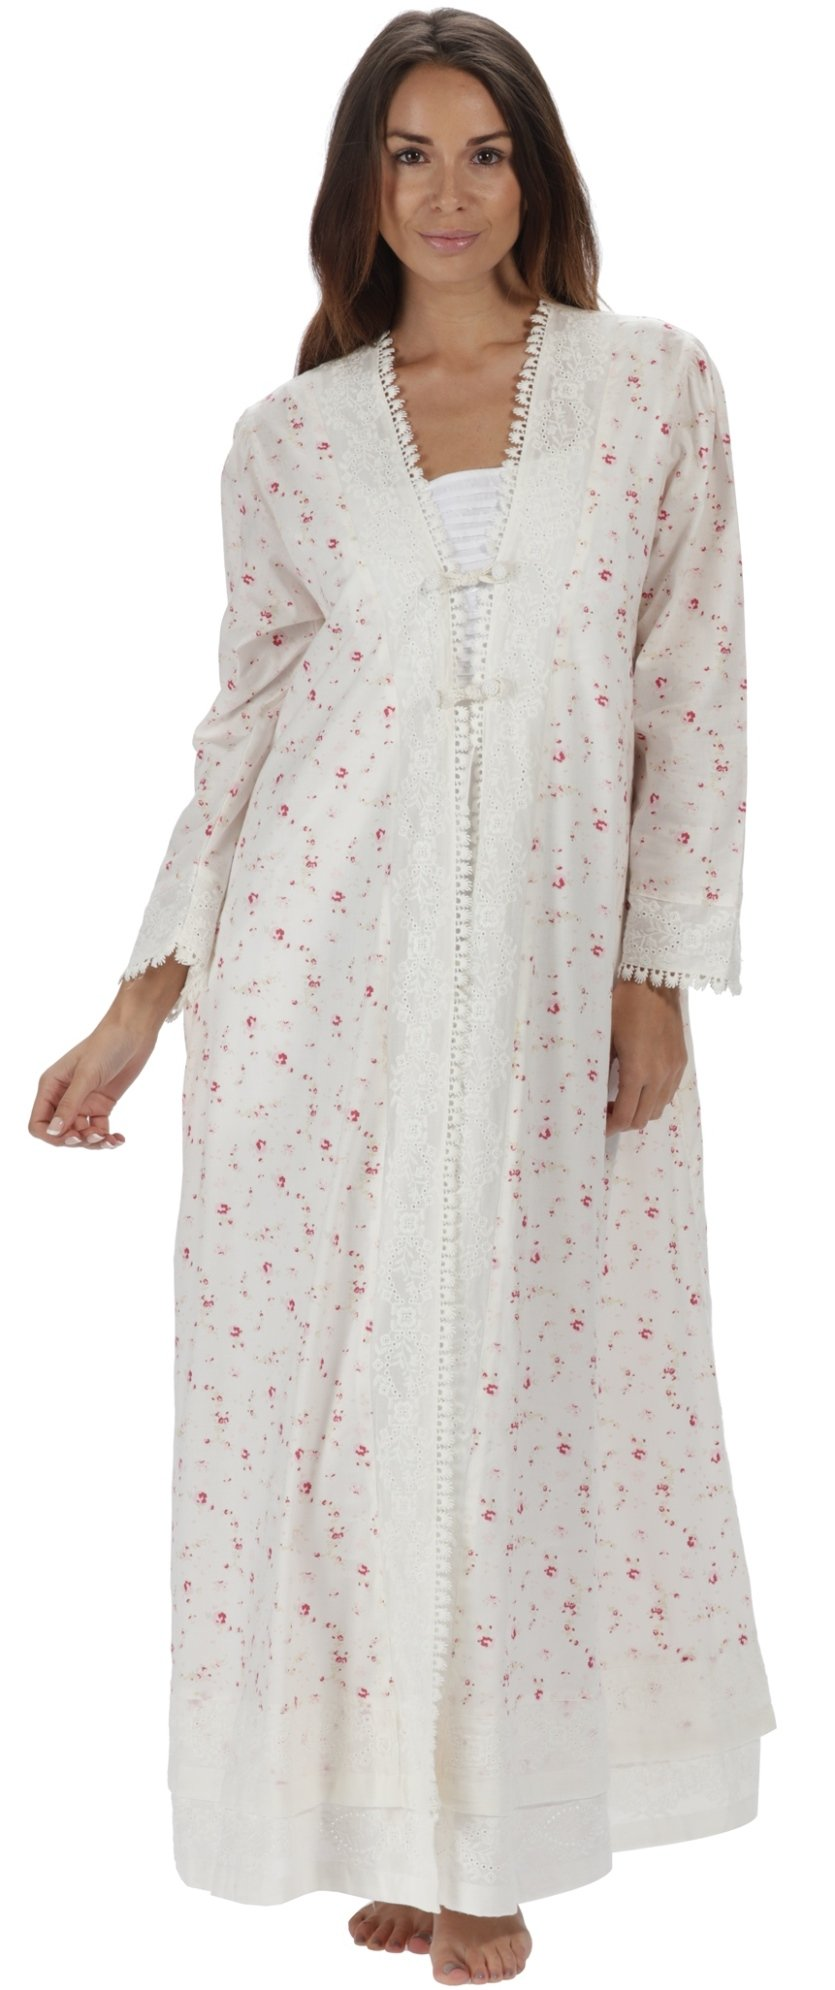 The 1 for U 100% Cotton Ladies Robe/Housecoat - Rosalind (XXL, Vintage Rose)